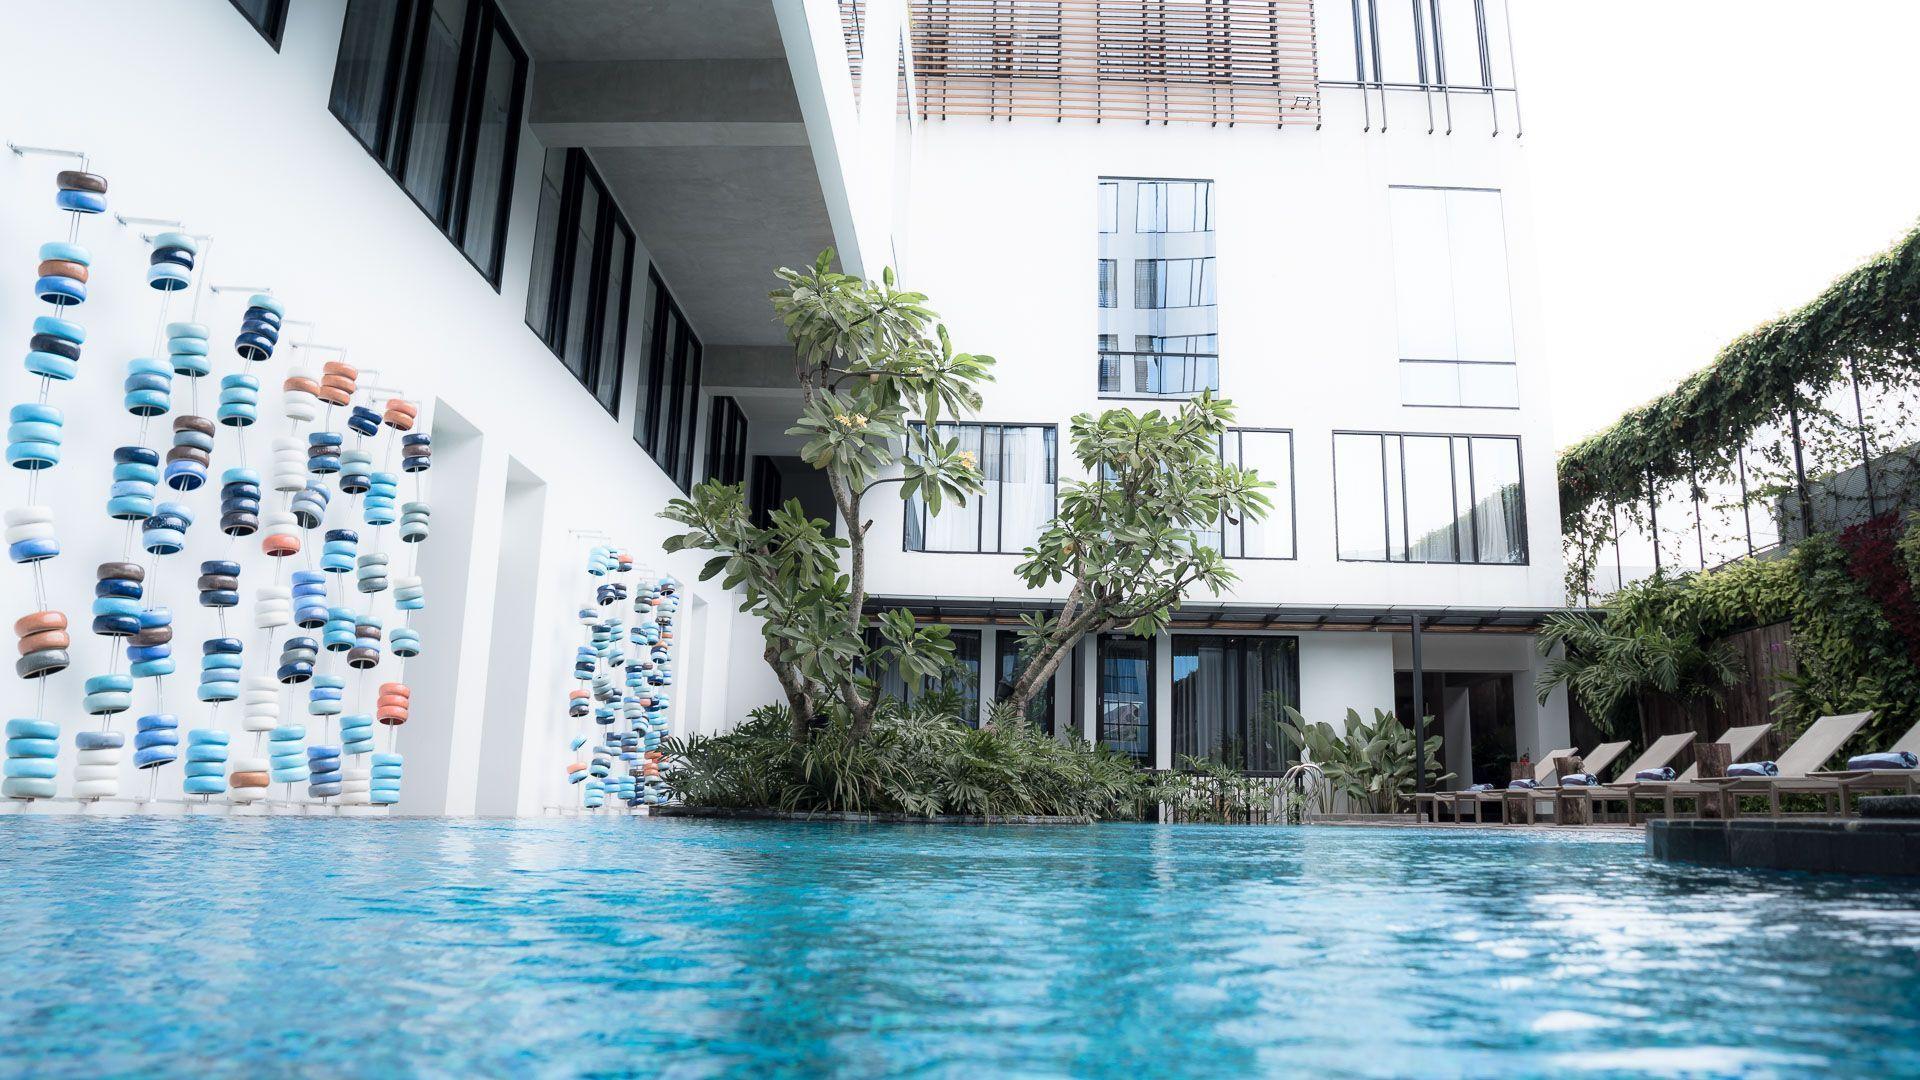 Lesvoyageuses-Indonesie-yogyacarta-gaia-cosmo-hotel-35